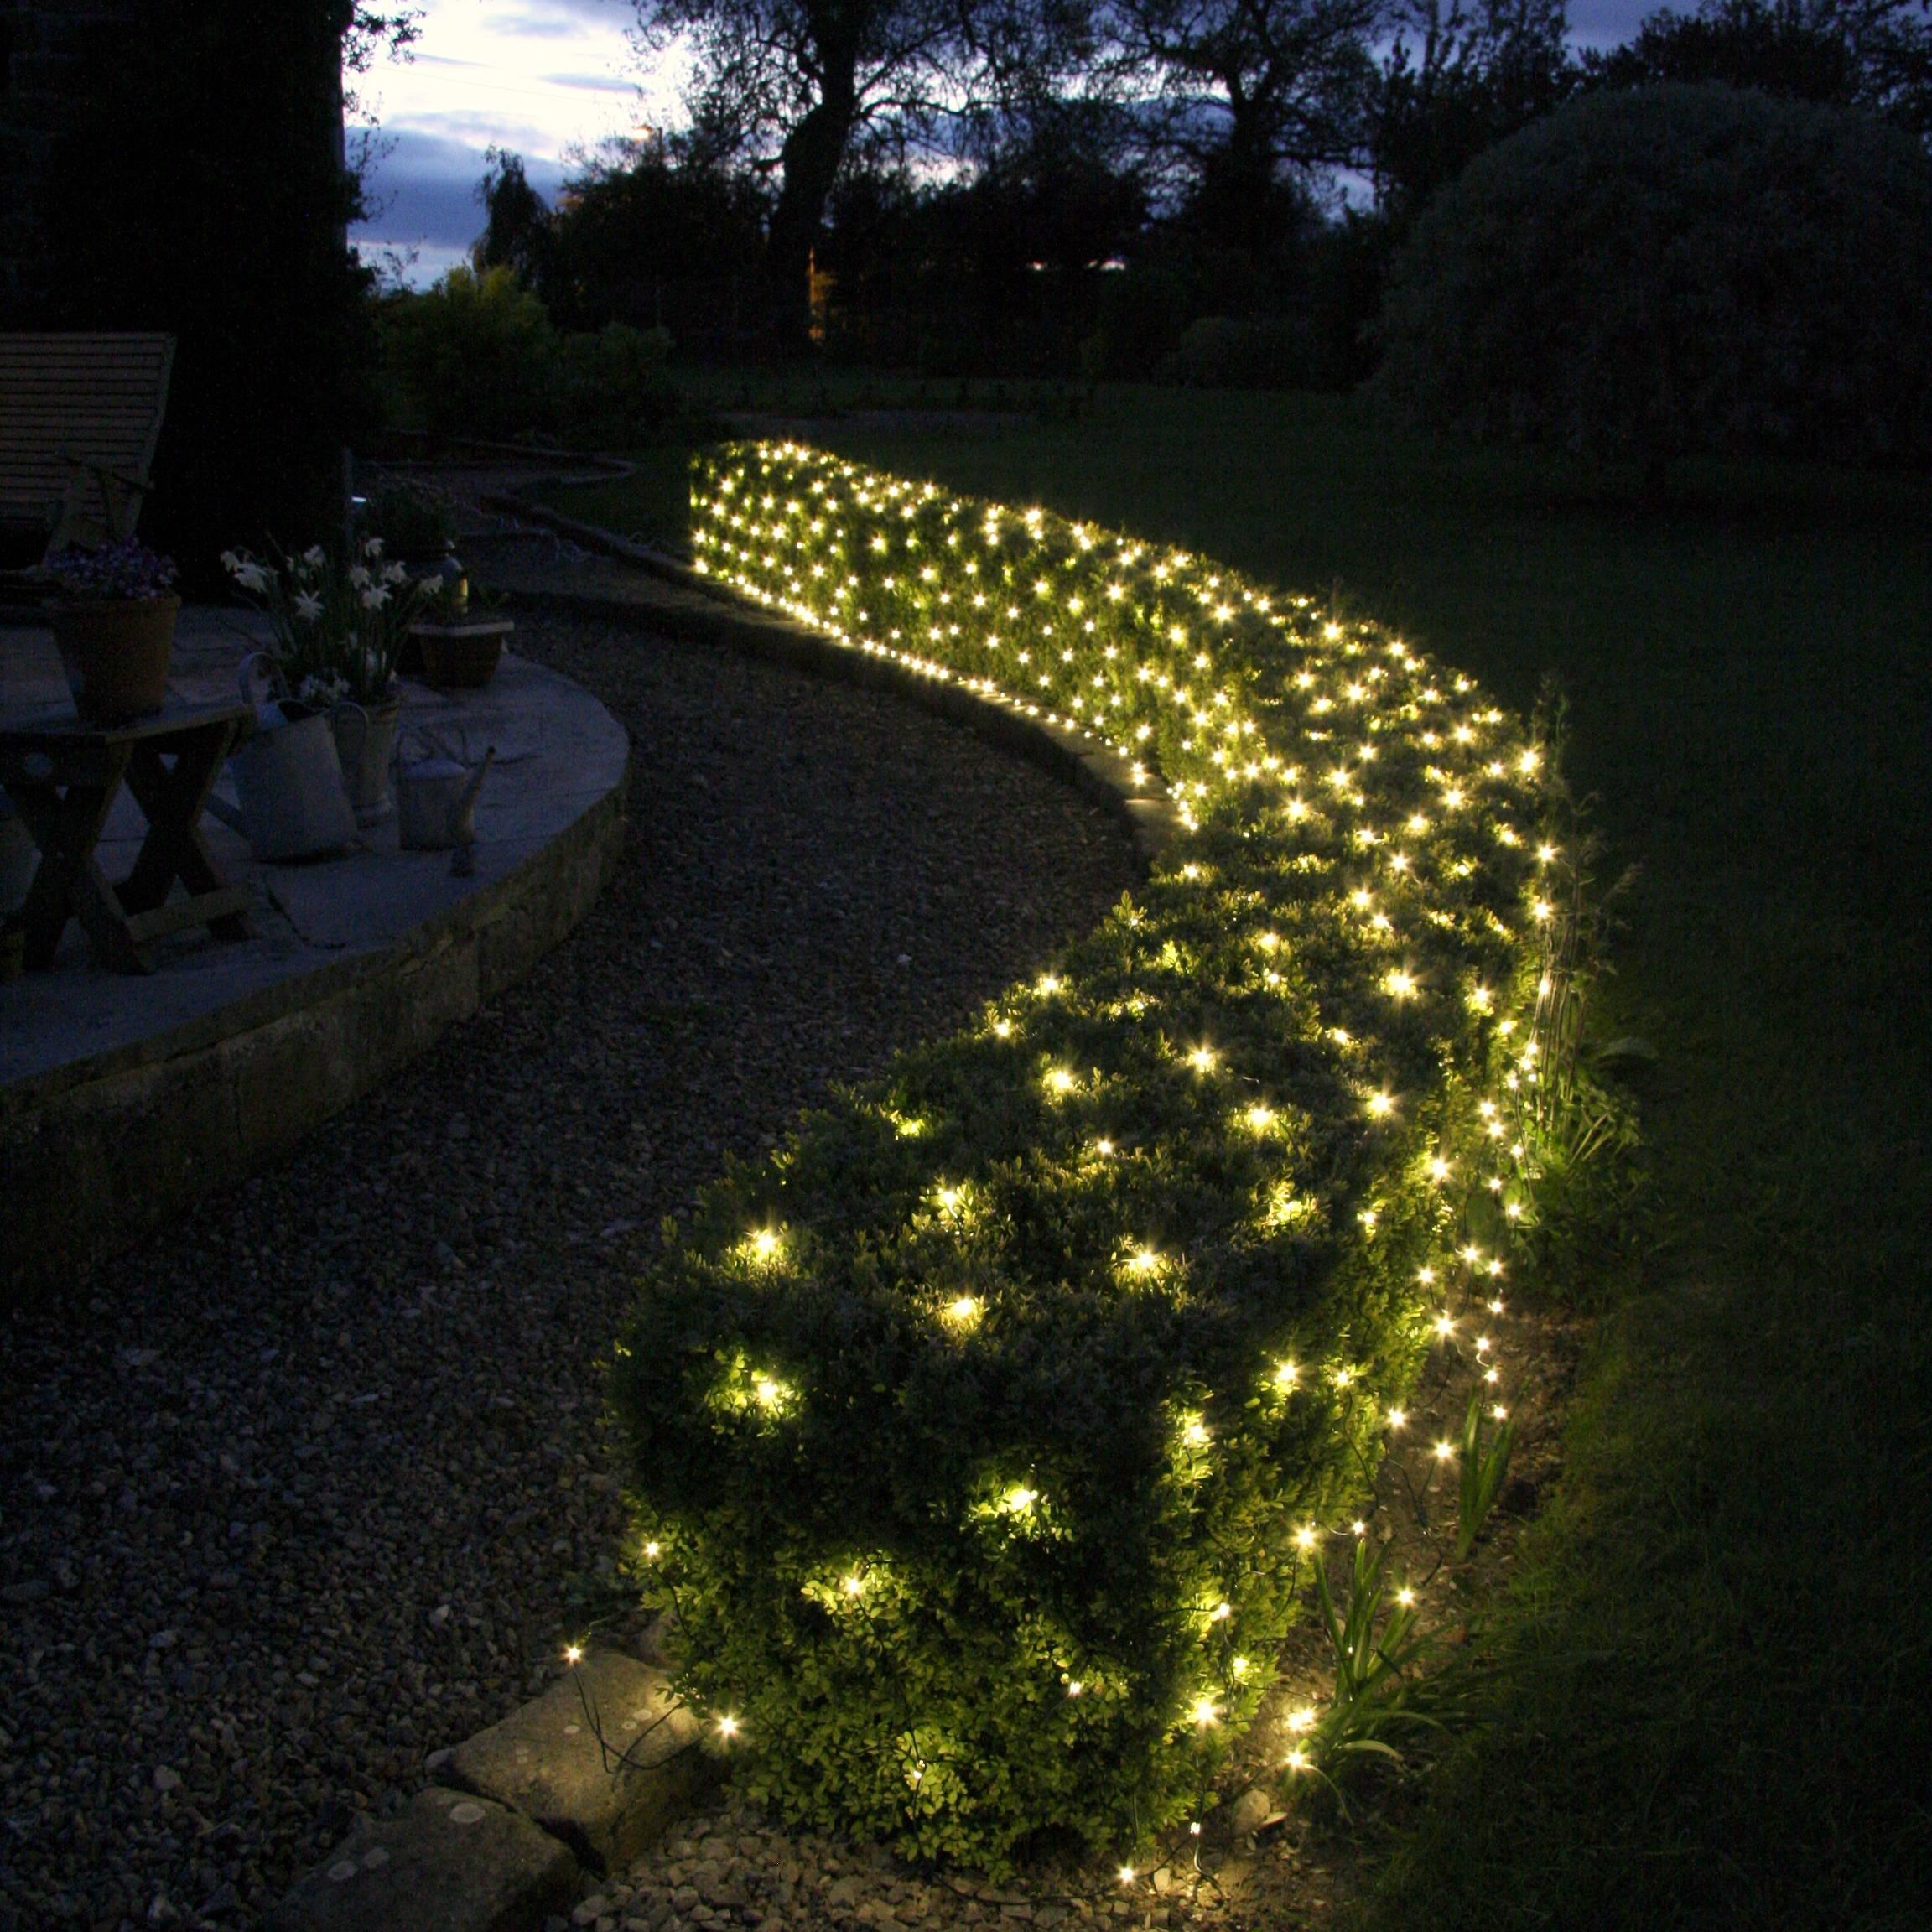 Warm white outdoor battery net lights in a Christmas garden